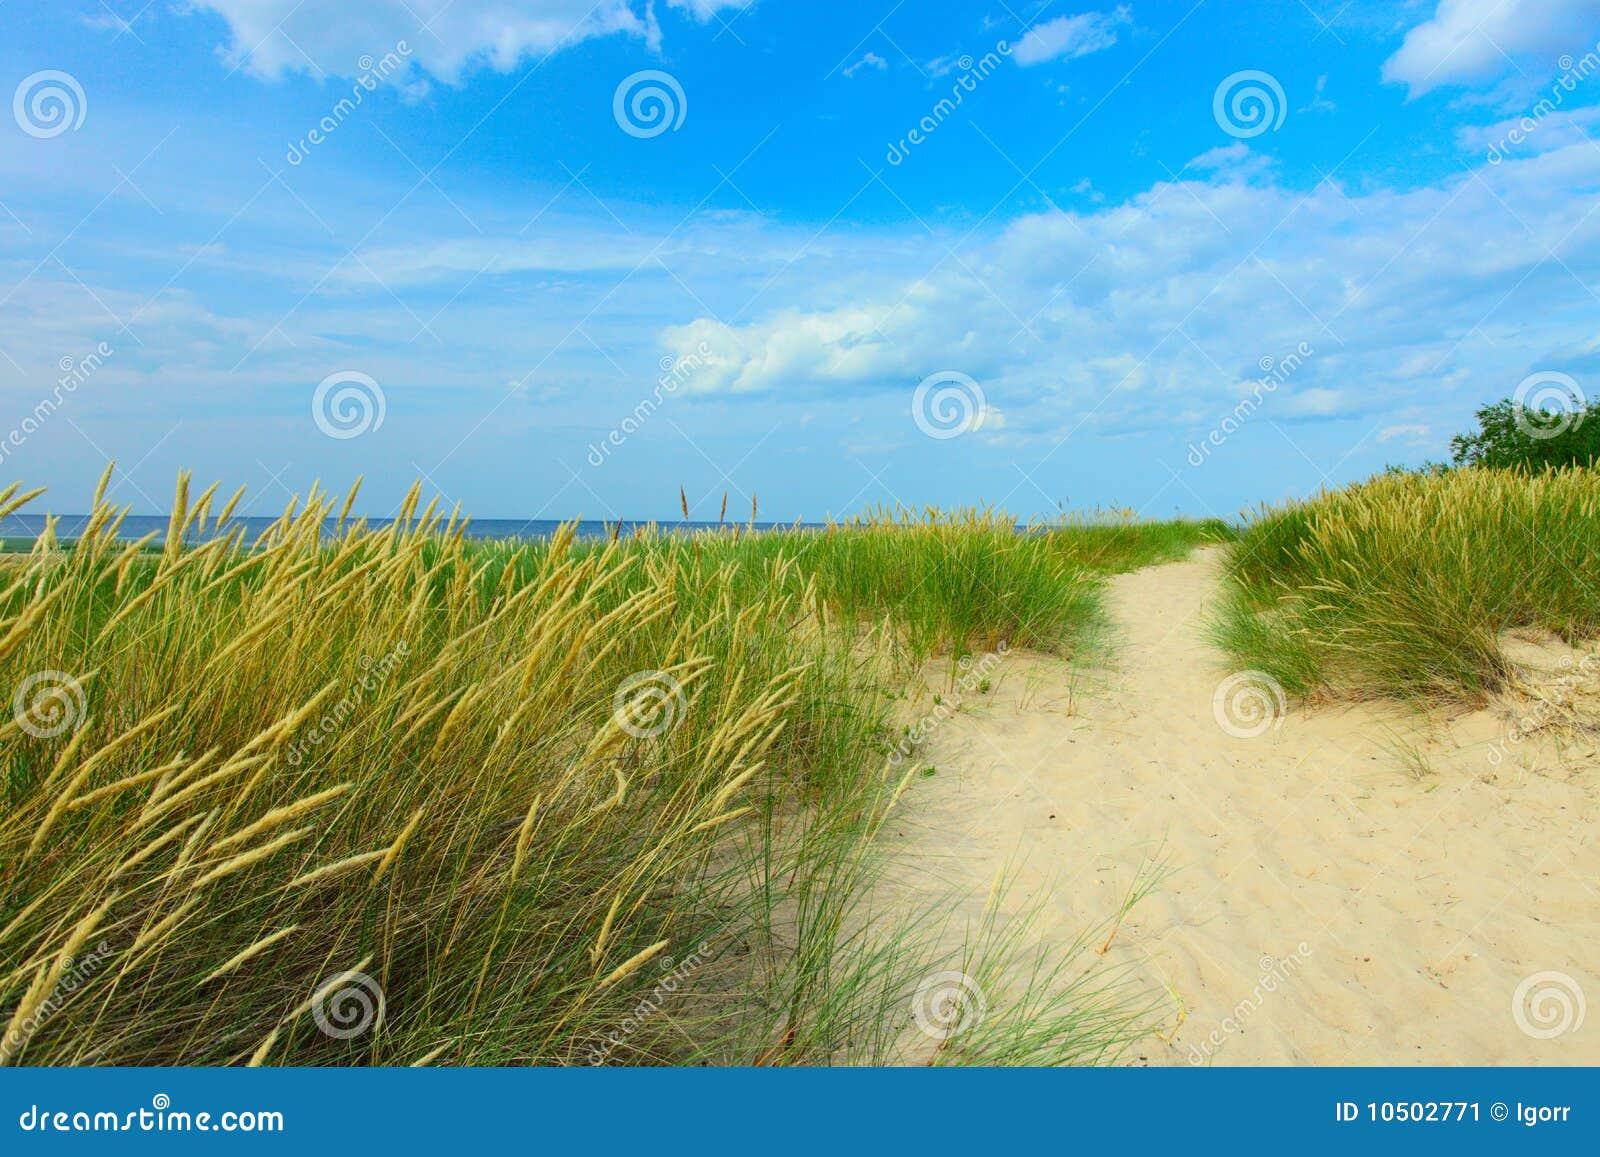 Download Coastline stock image. Image of horizon, climate, green - 10502771